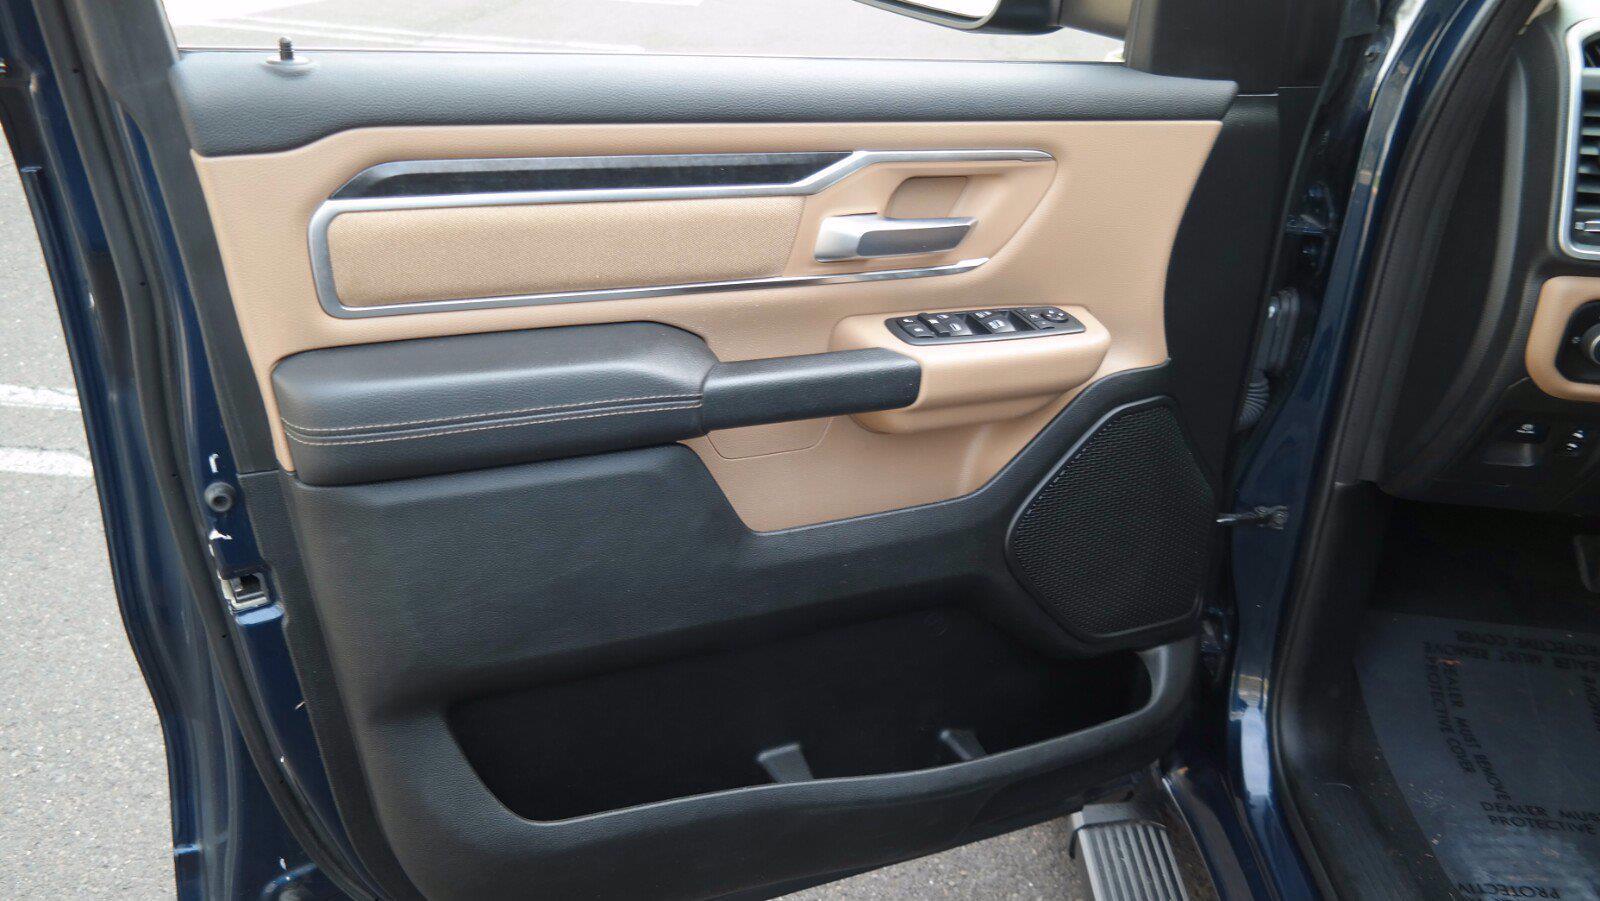 2019 Ram 1500 Quad Cab 4x4, Pickup #FL101401 - photo 9